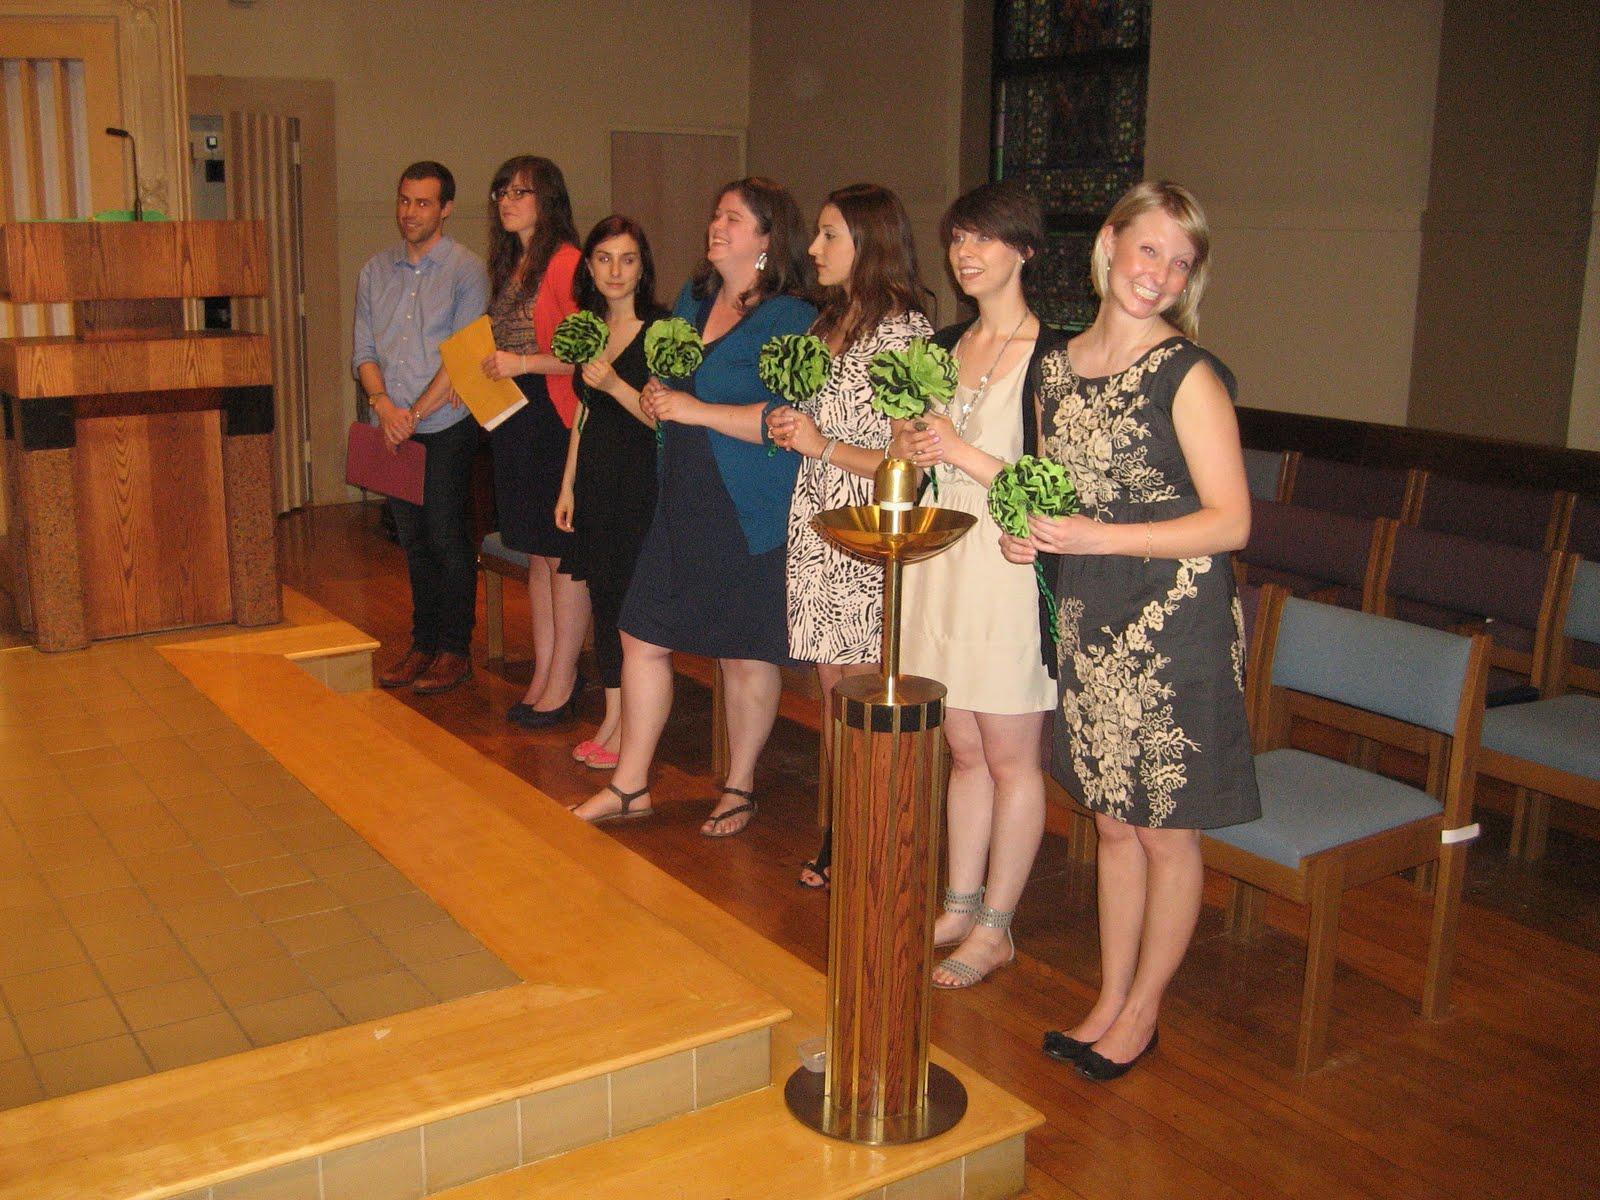 Wedding Recap: The Rehearsal